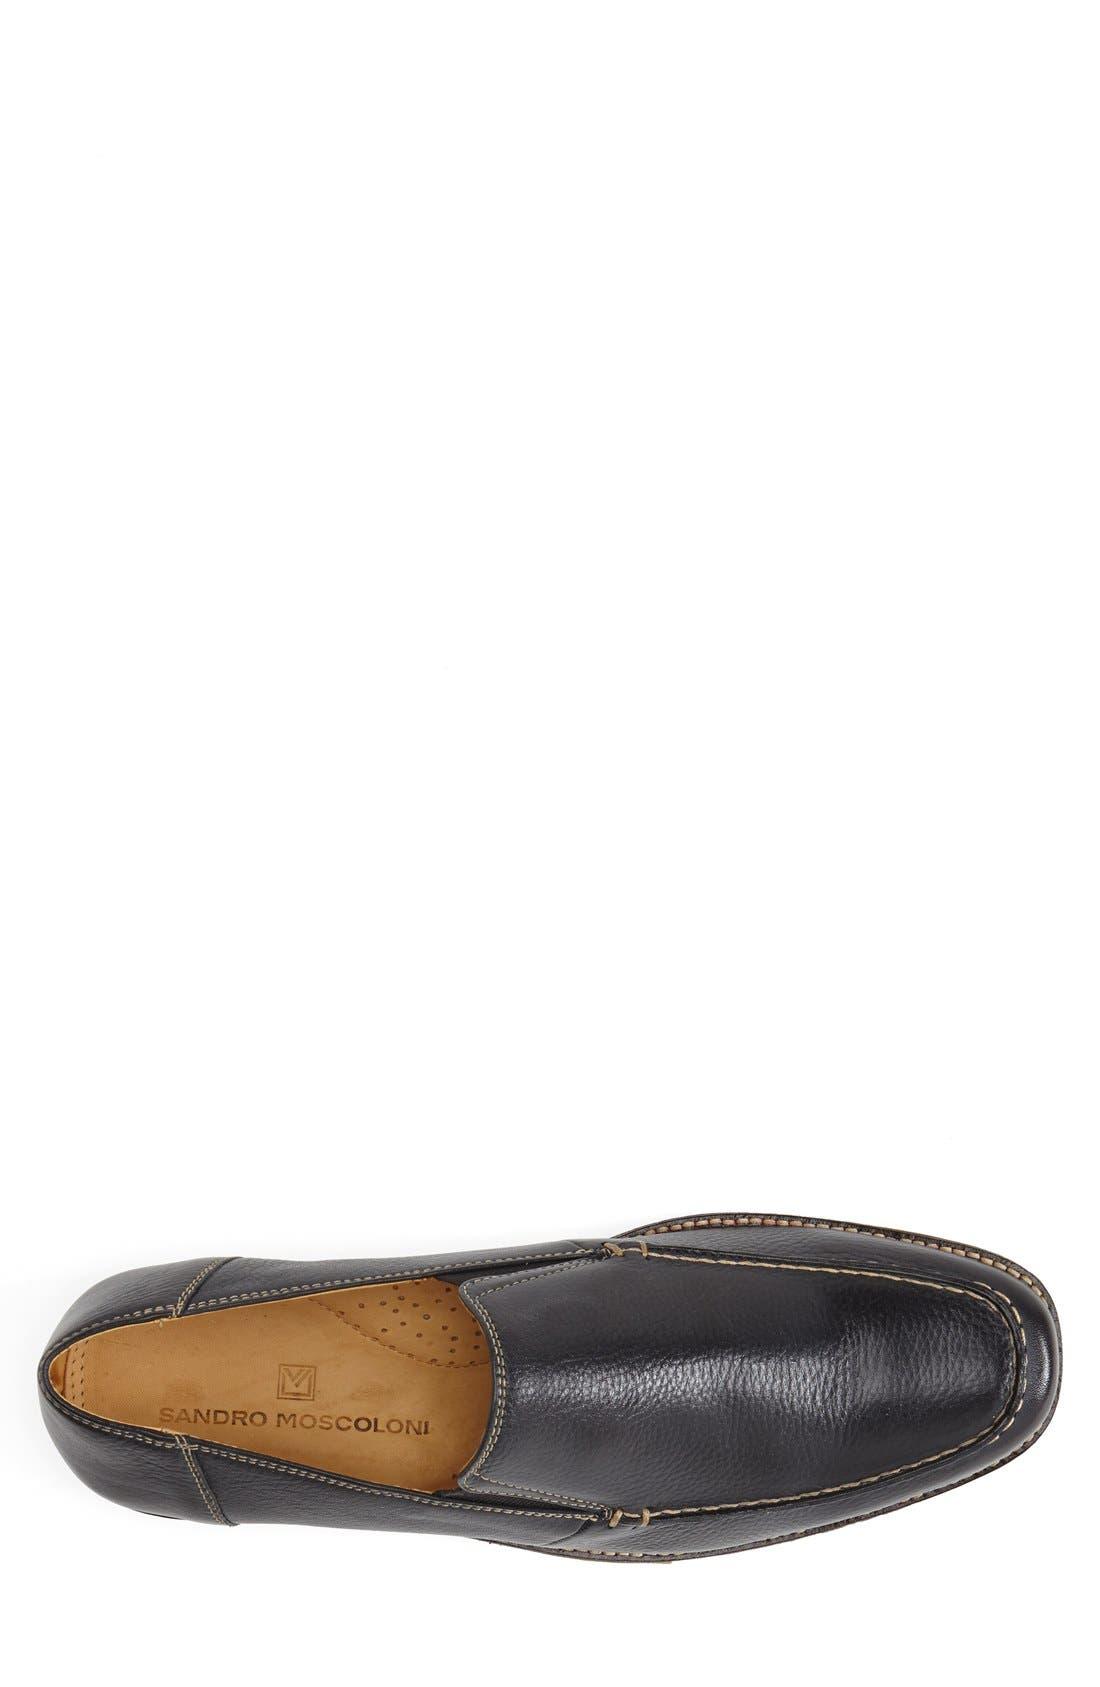 'Easy' Leather Venetian Loafer,                             Alternate thumbnail 3, color,                             NAVY